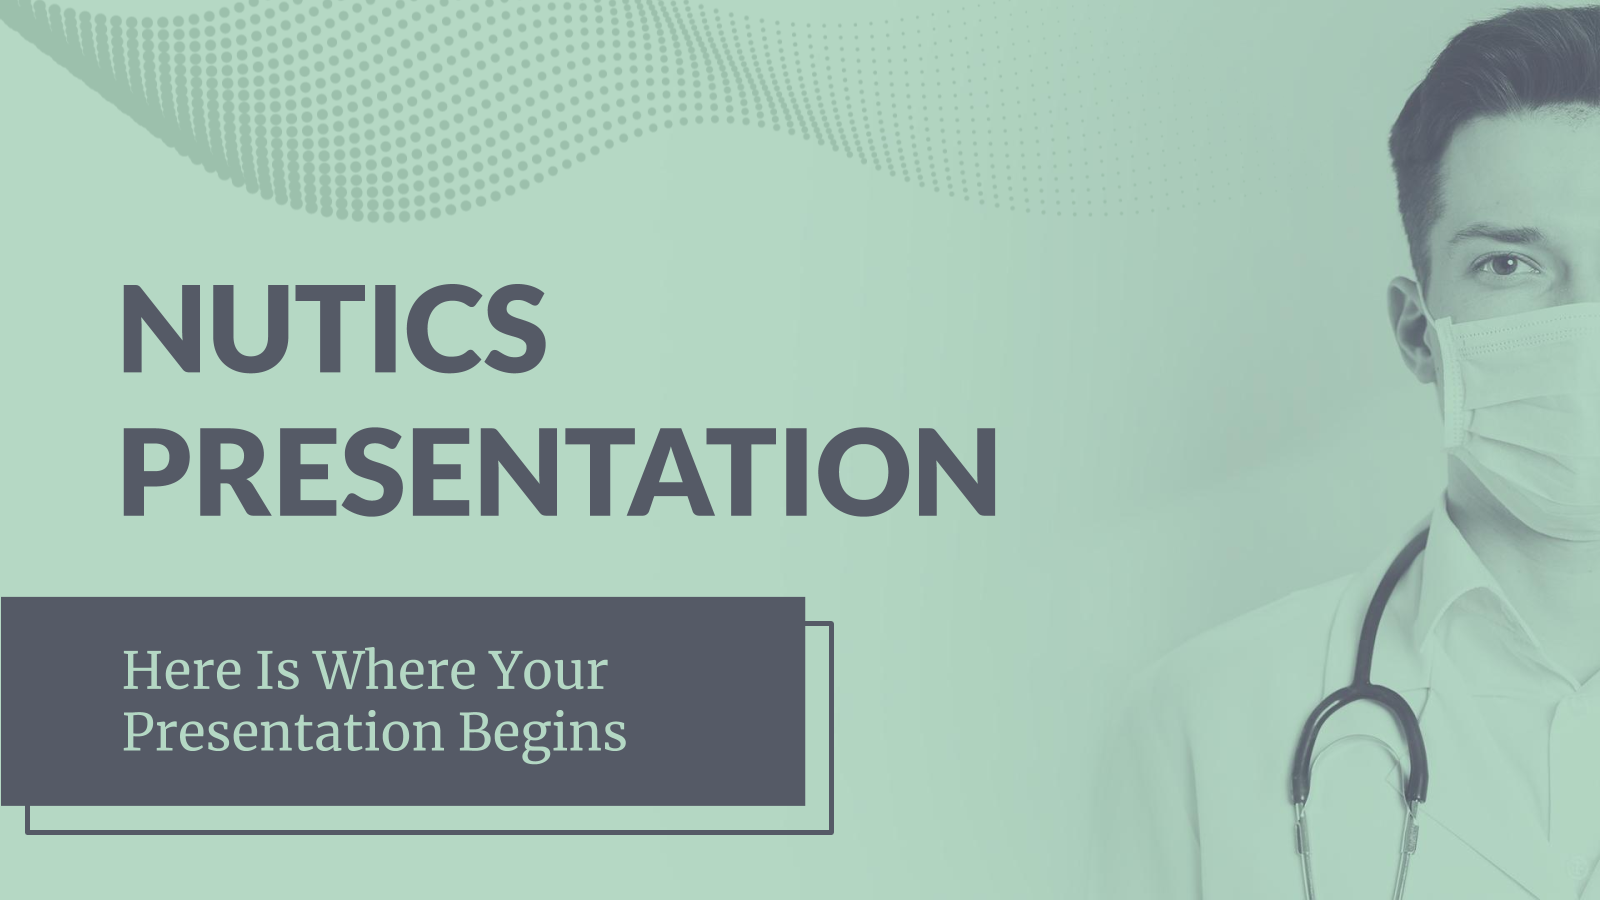 Nutics presentation template